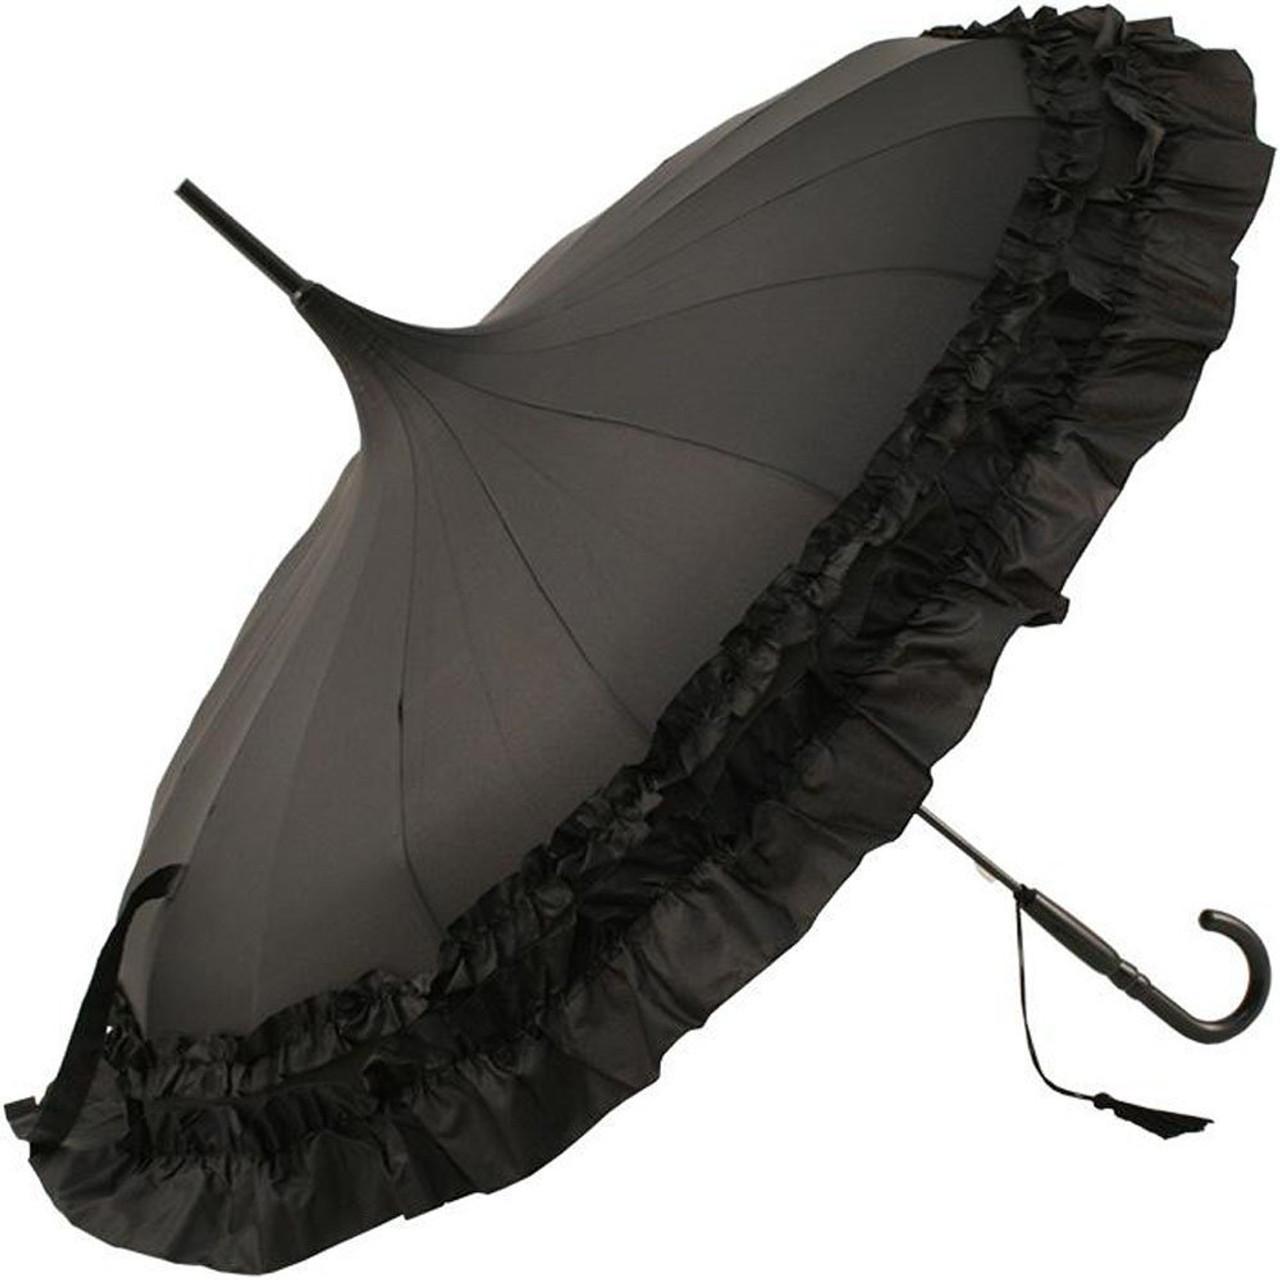 b47d514d9 Soake Stunning Classic Plain Frilled Edge Pagoda Style Long Umbrella Black  - umbrellasuperstore.co.uk